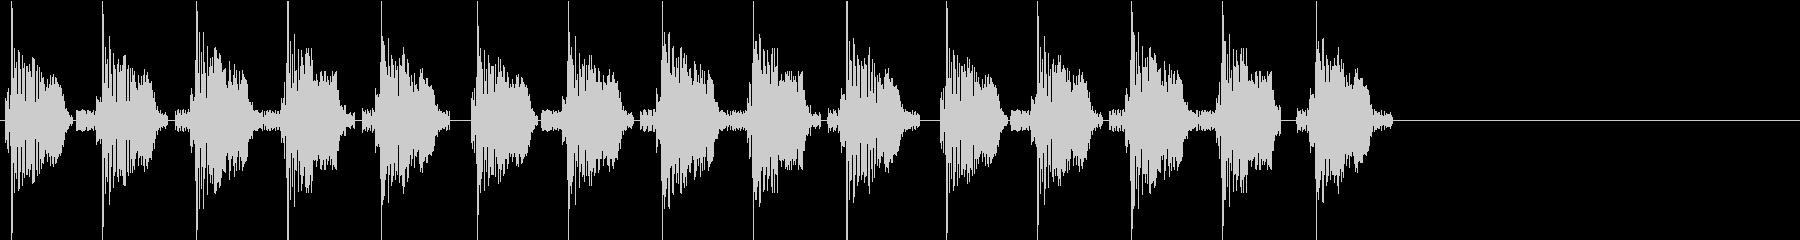 KANTププ自主規制音1shortの未再生の波形